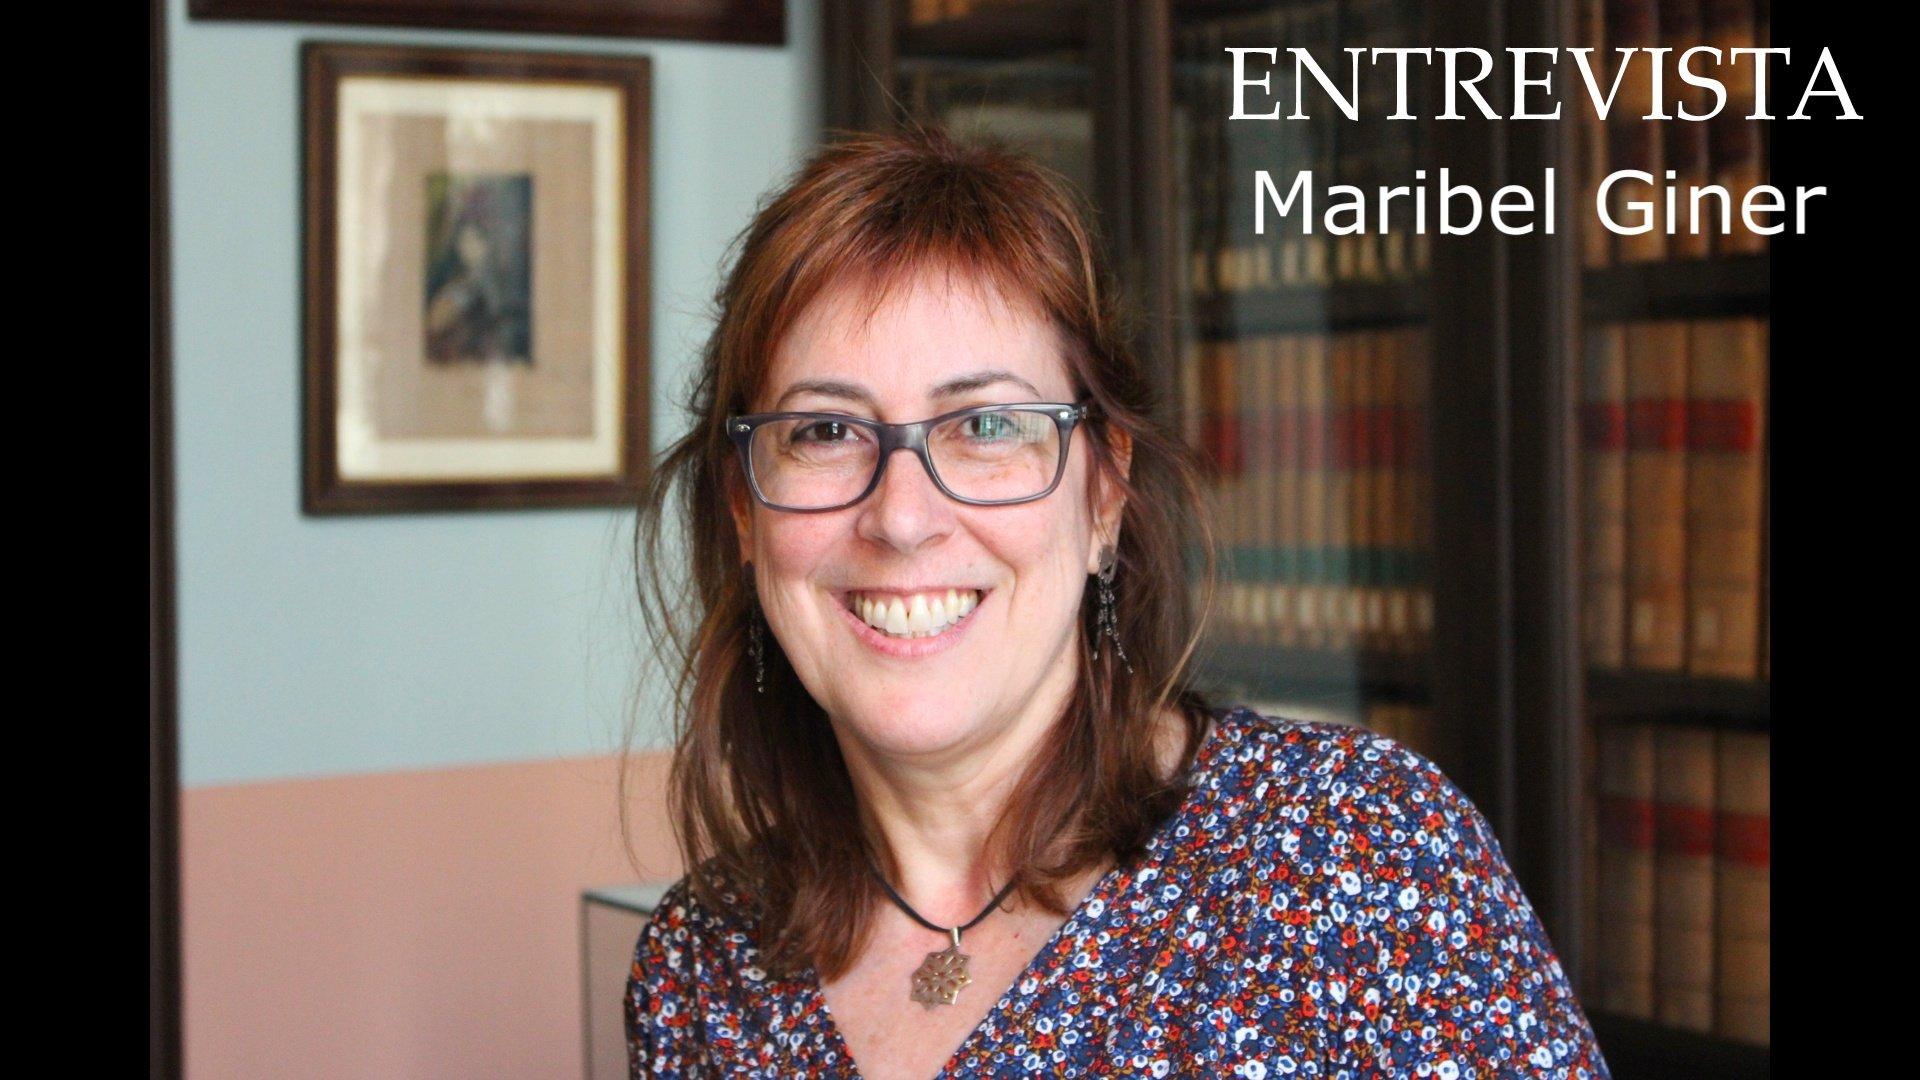 Maribel Giner